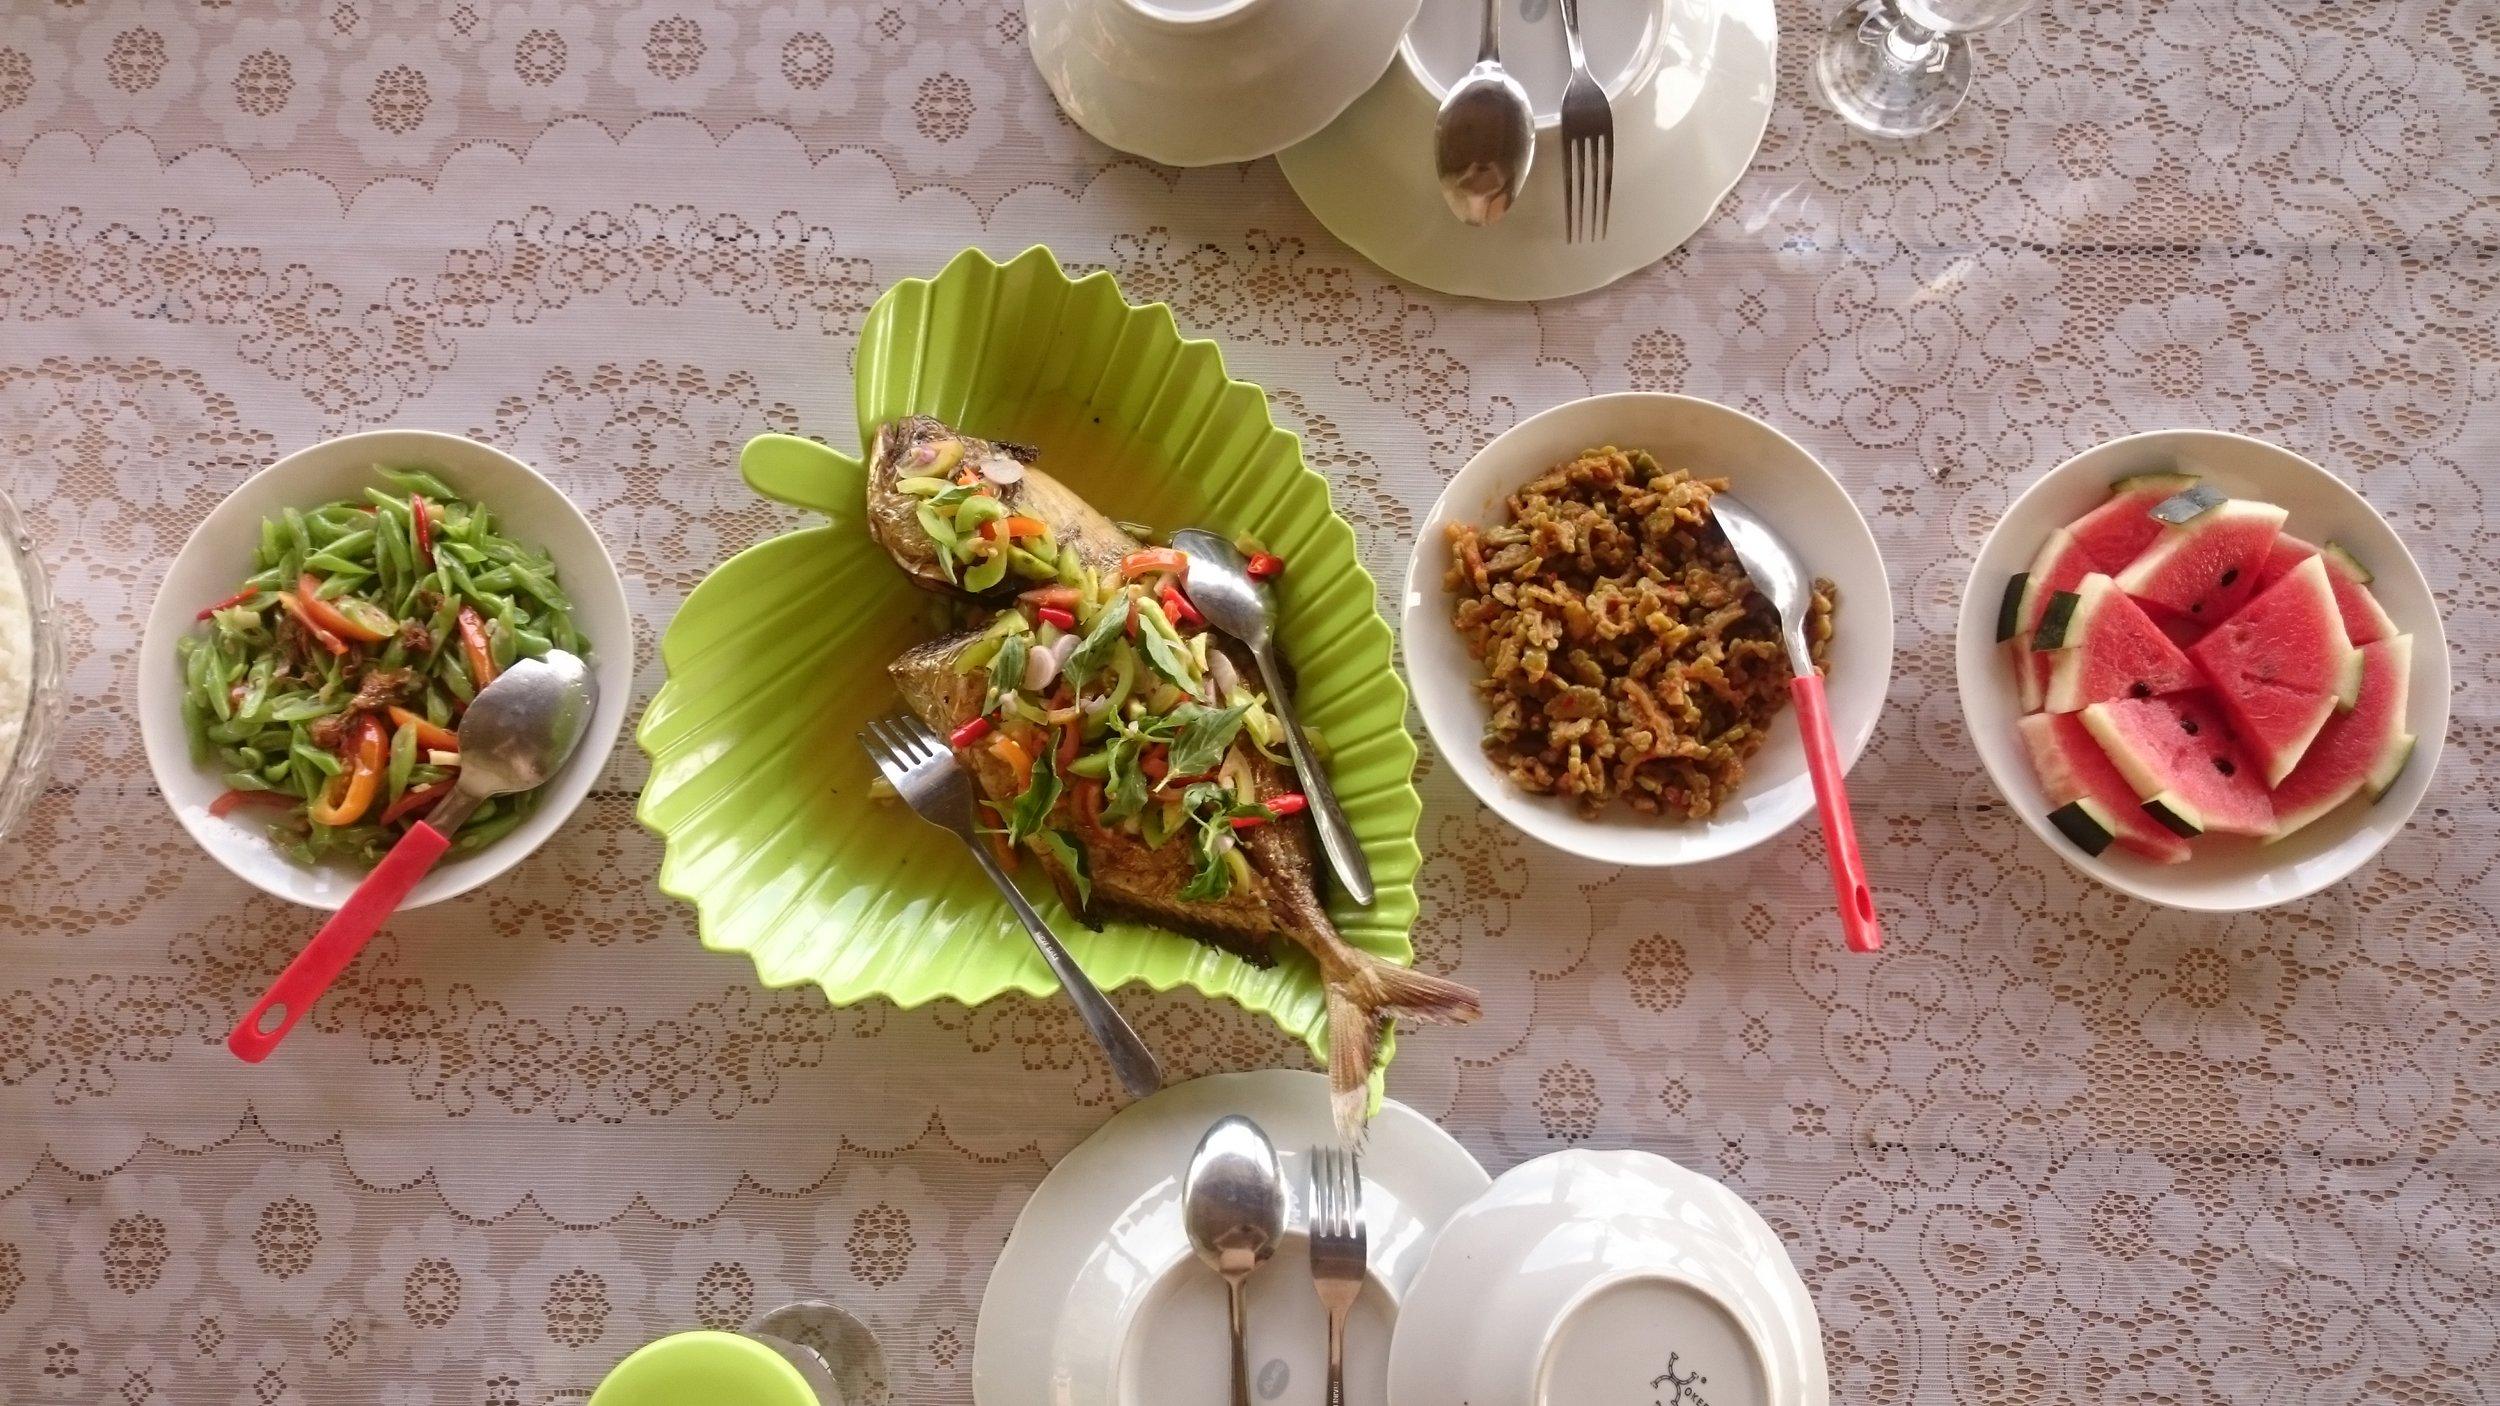 Makan Siang ala Chef Lisar Bahari, Sawai